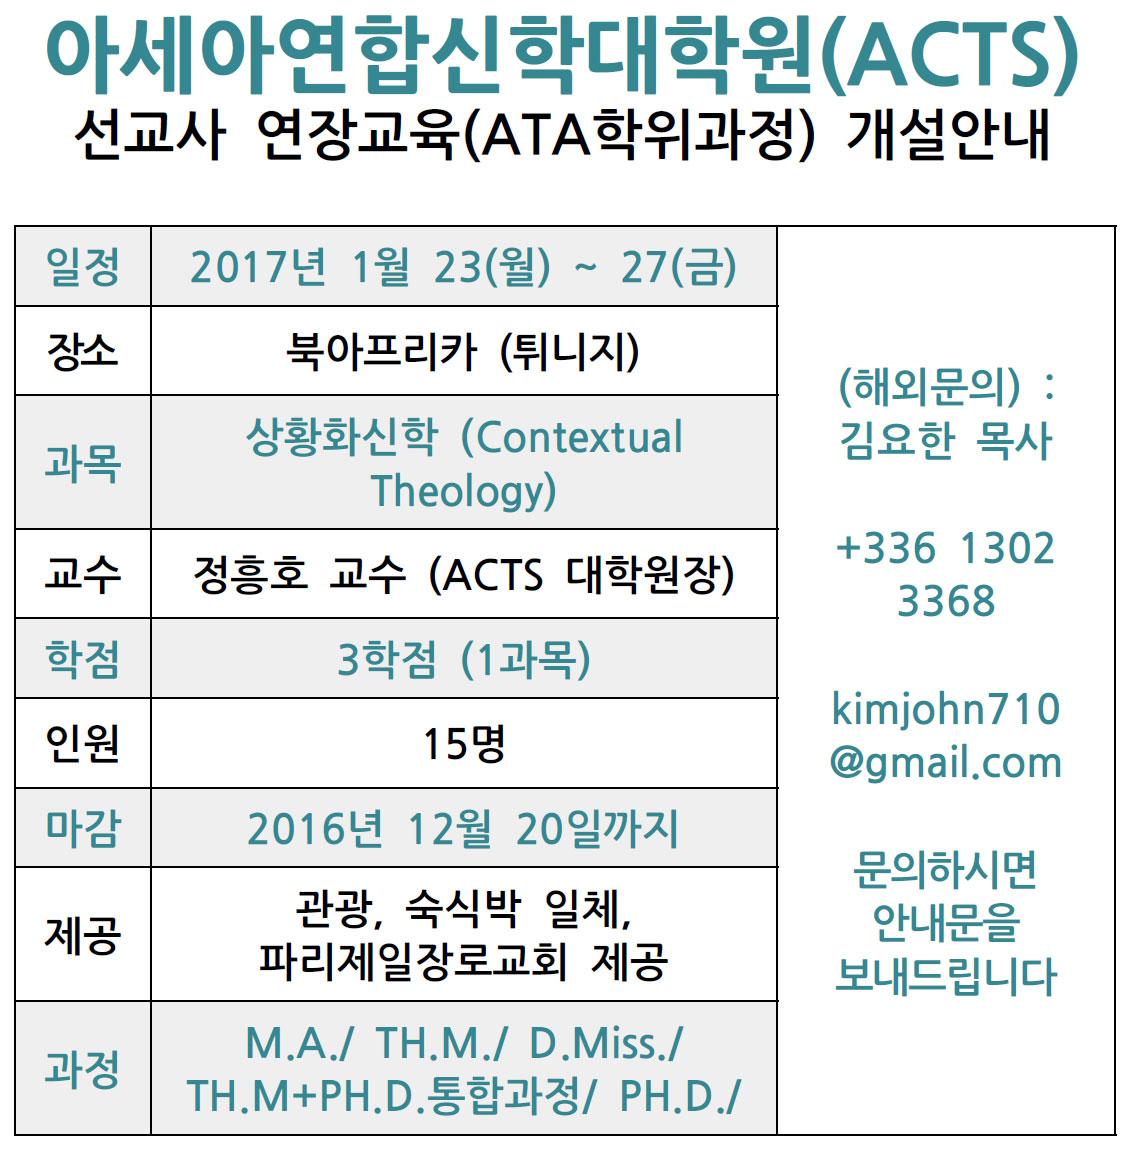 957-acts1.jpg